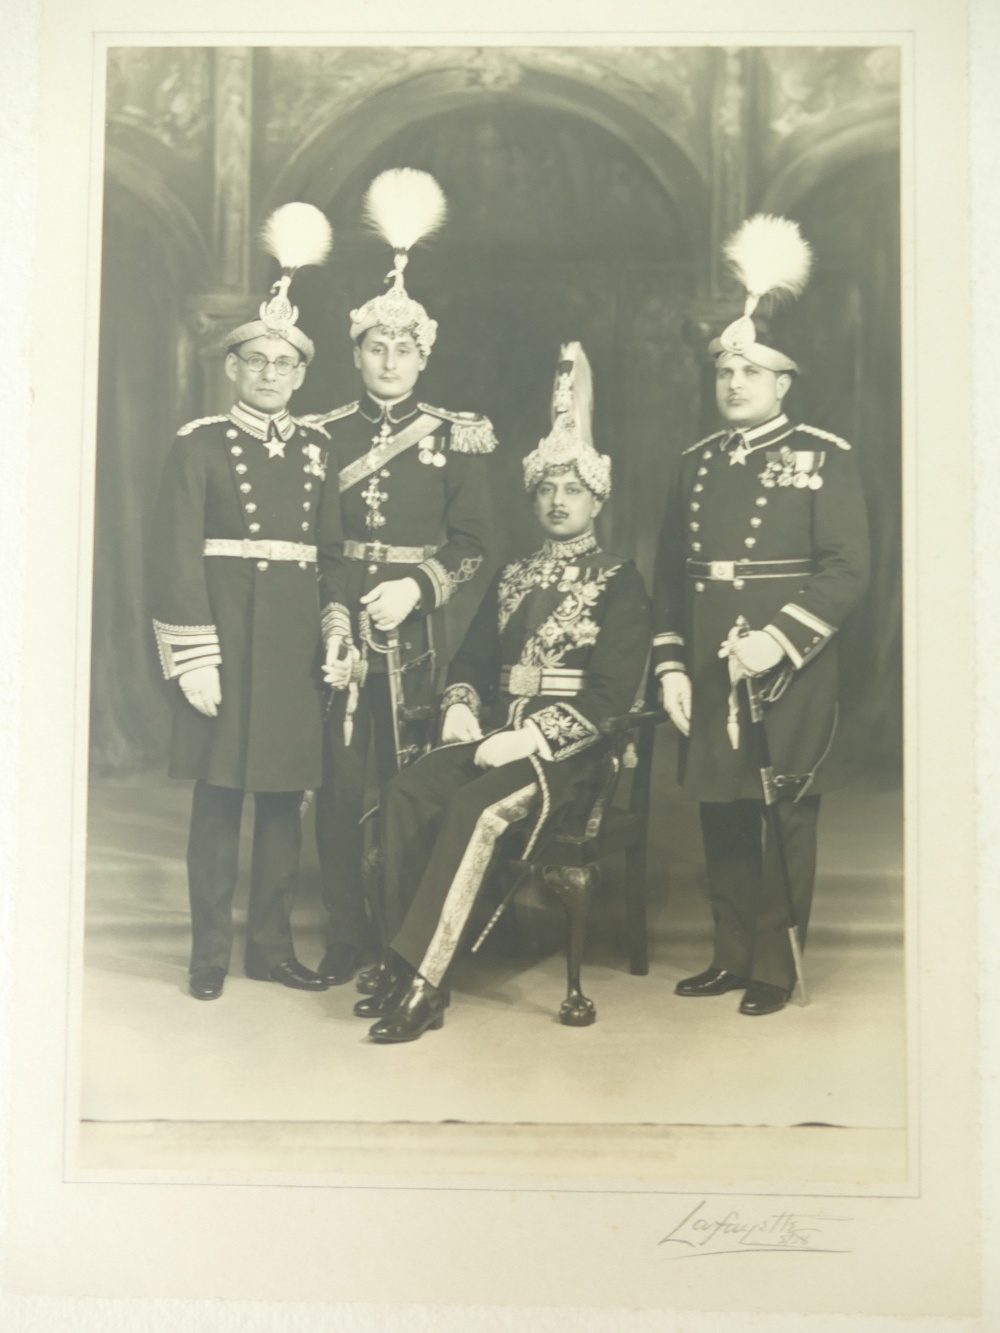 Lot 4 - Nepal - His ex. Lt. General Krishna Shumshere Jung Bahadur Rana K.B.E.